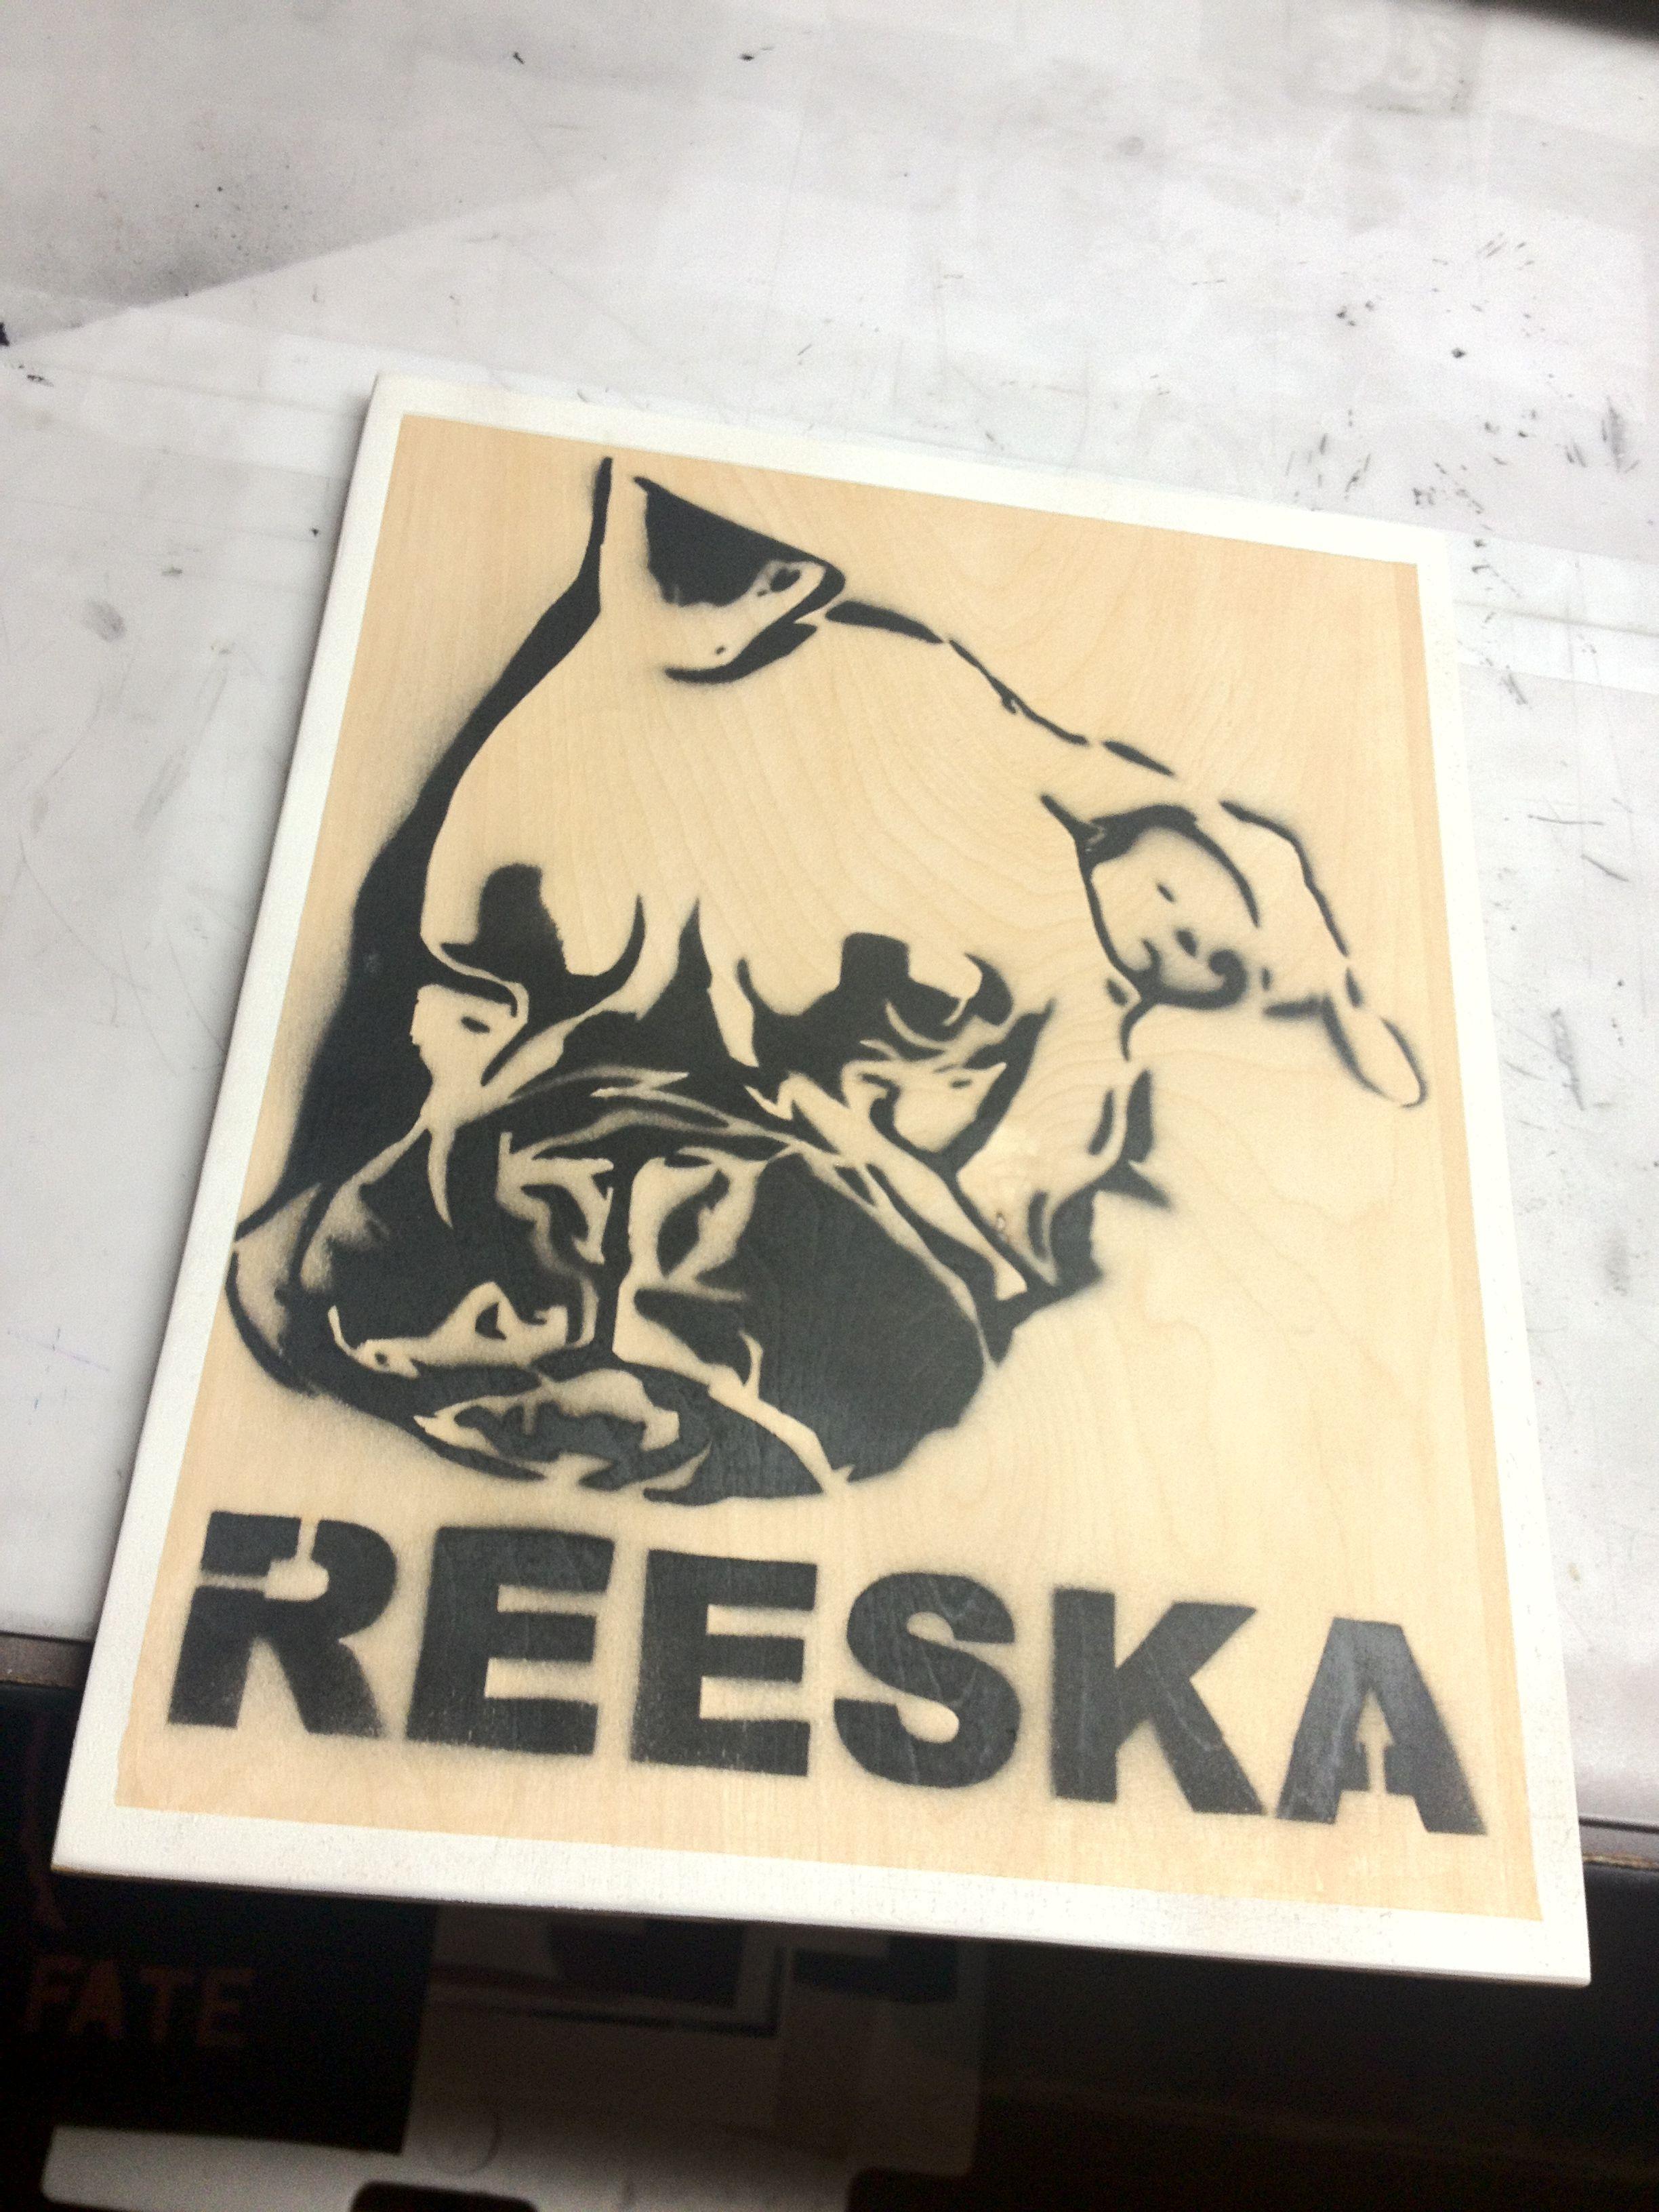 Reeska